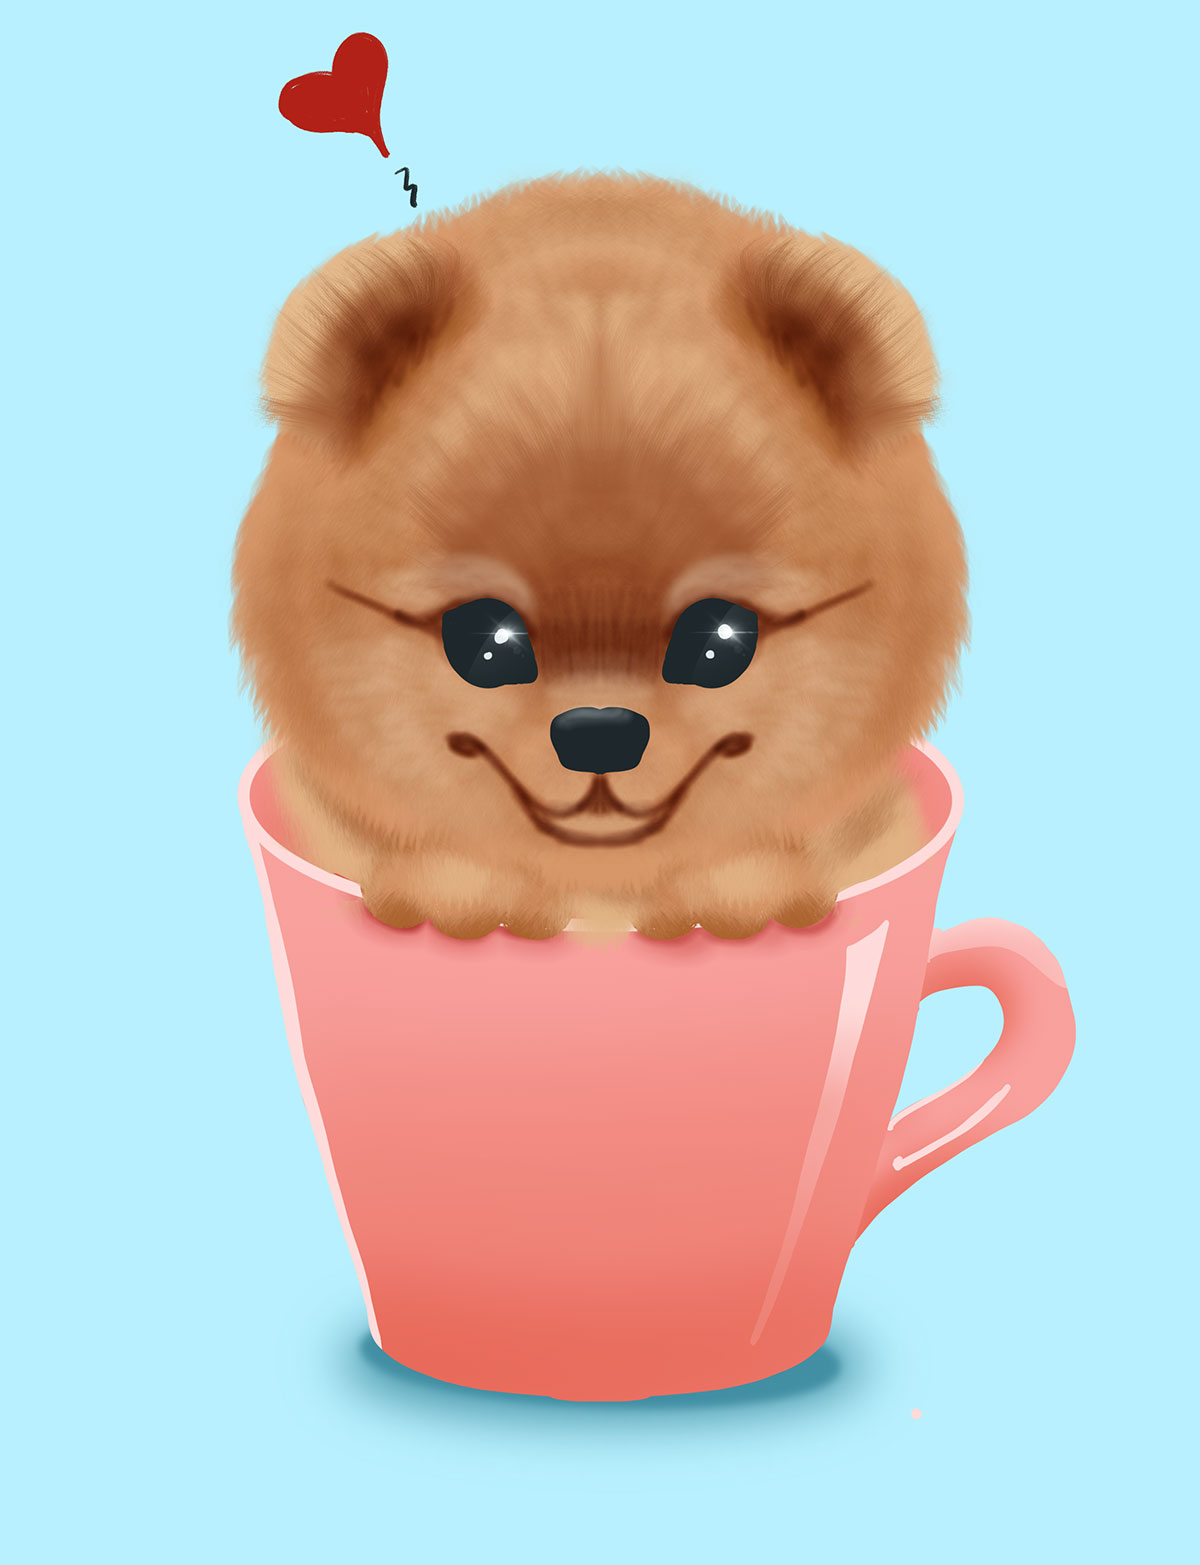 digital drawing of a puppy in a pinkish mug